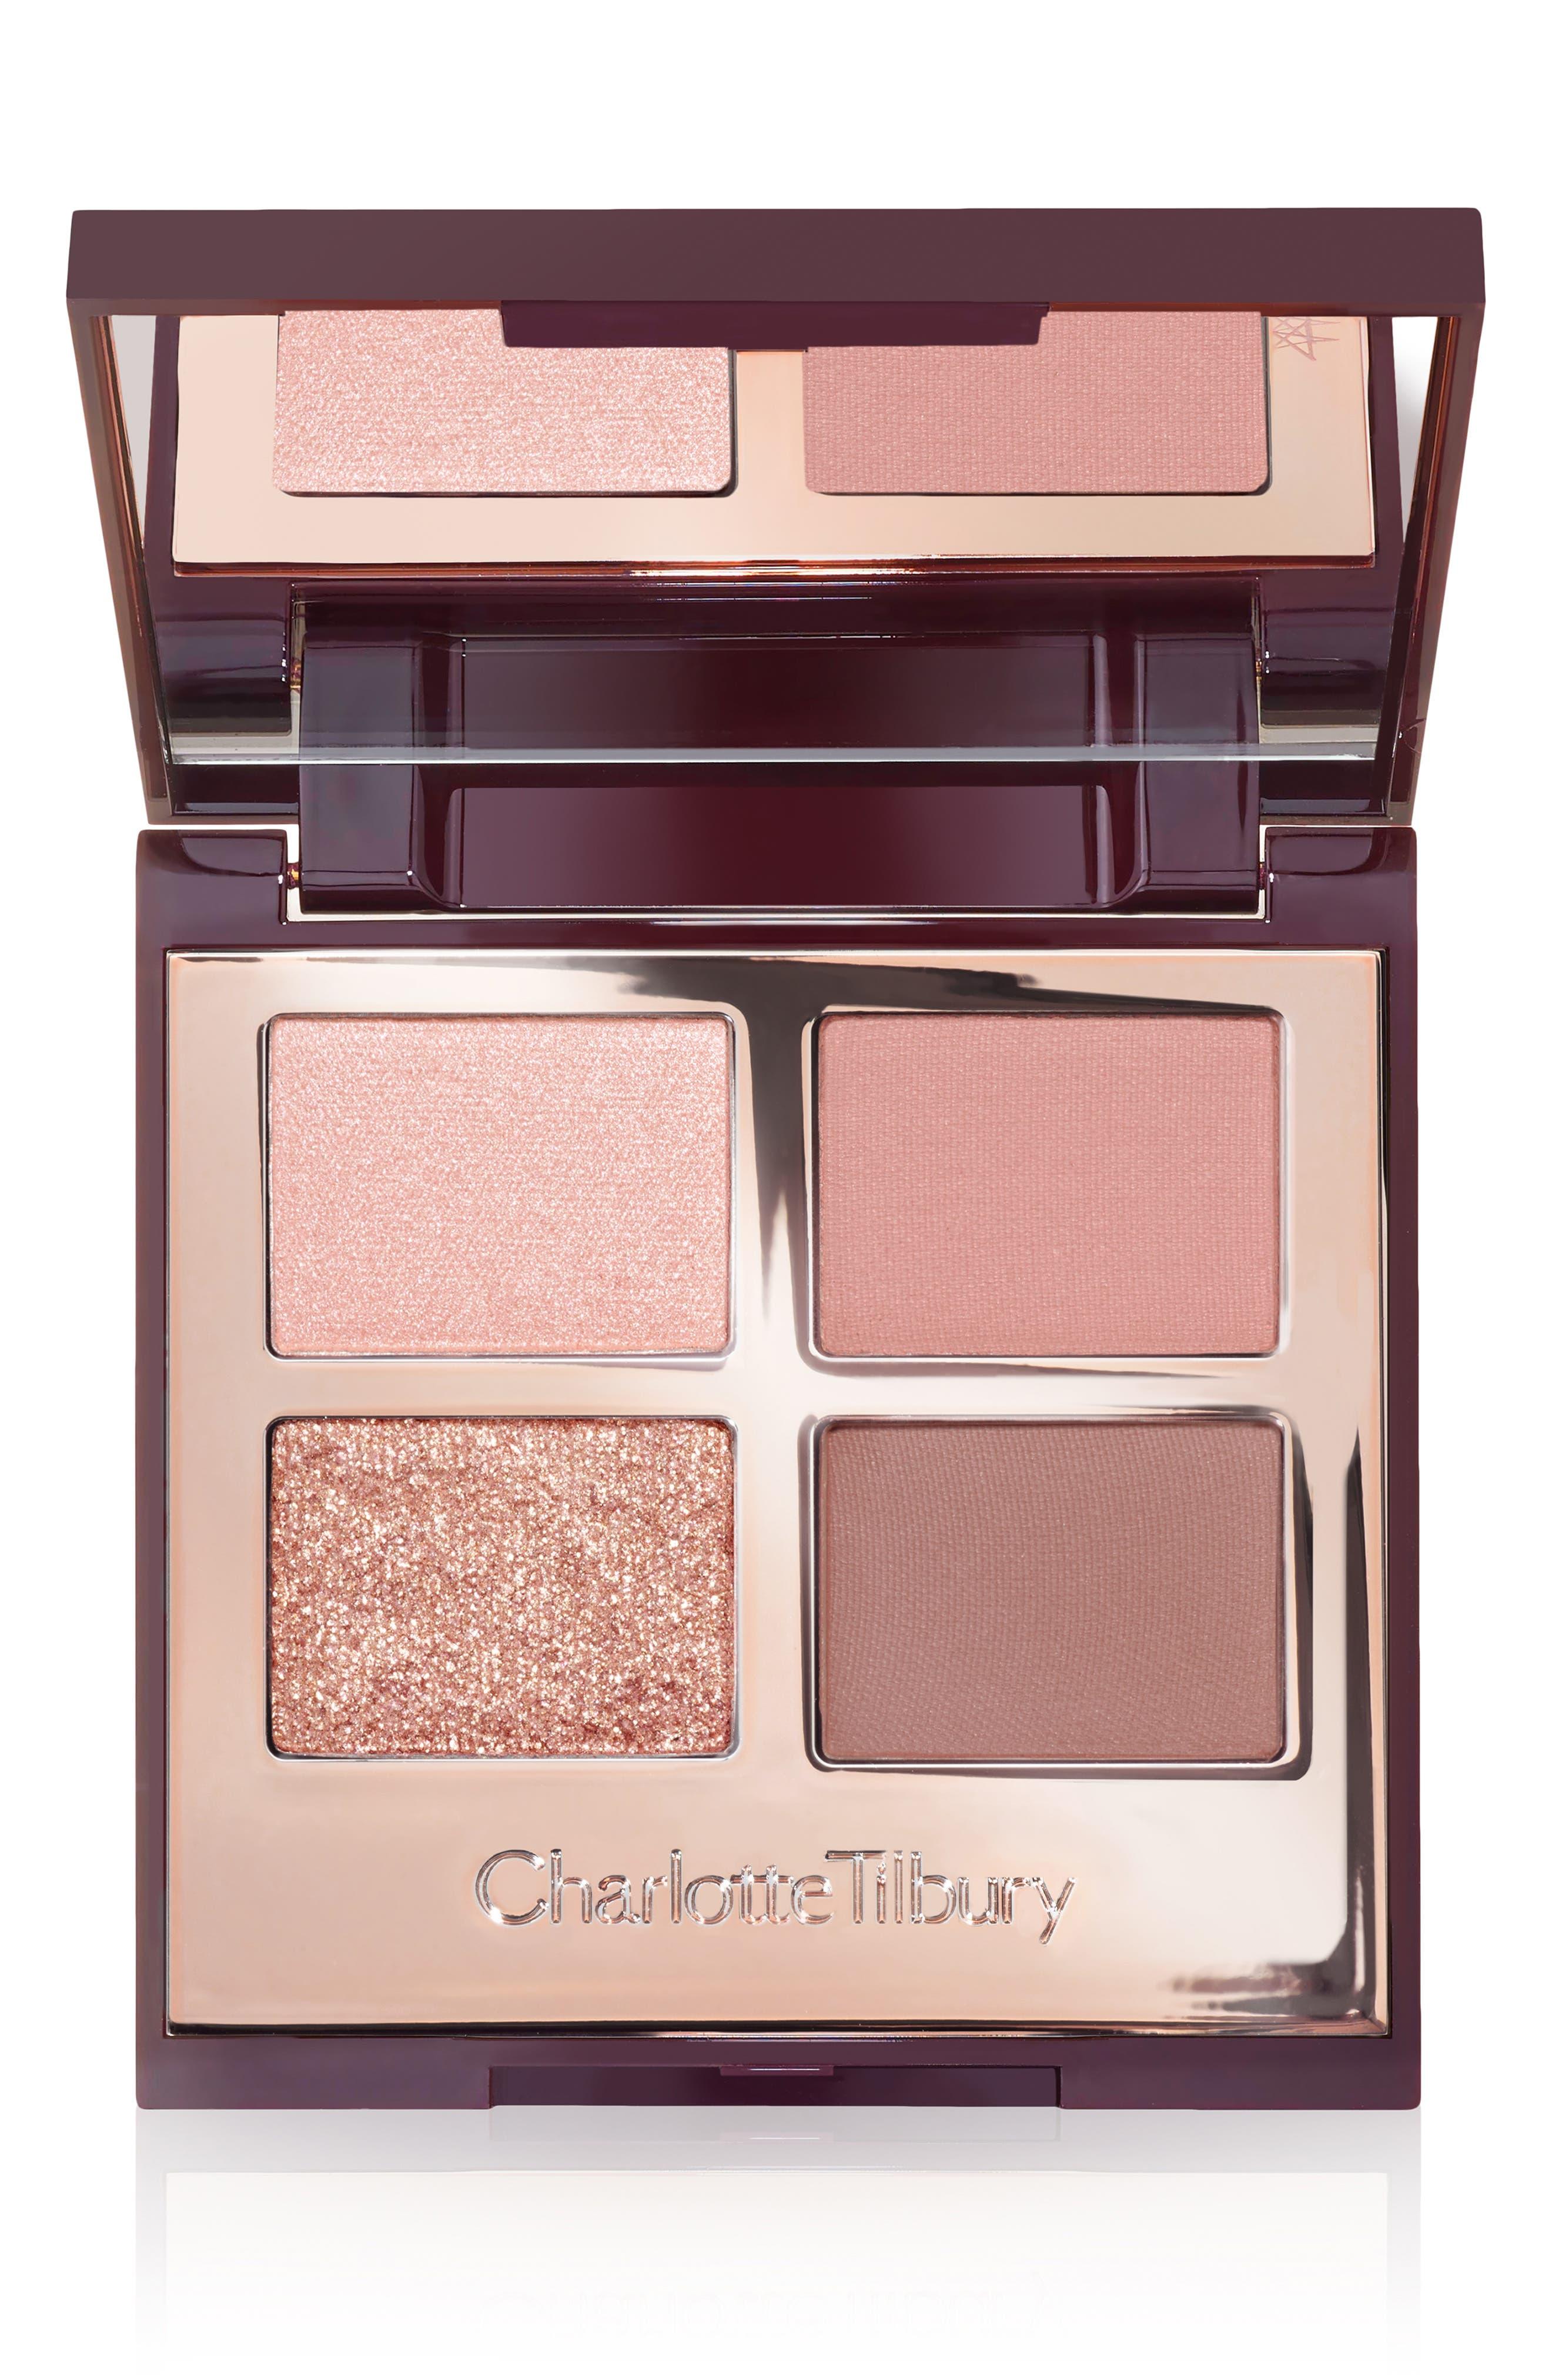 CHARLOTTE TILBURY Pillowtalk Luxury Eyeshadow Palette, Main, color, PILLOW TALK